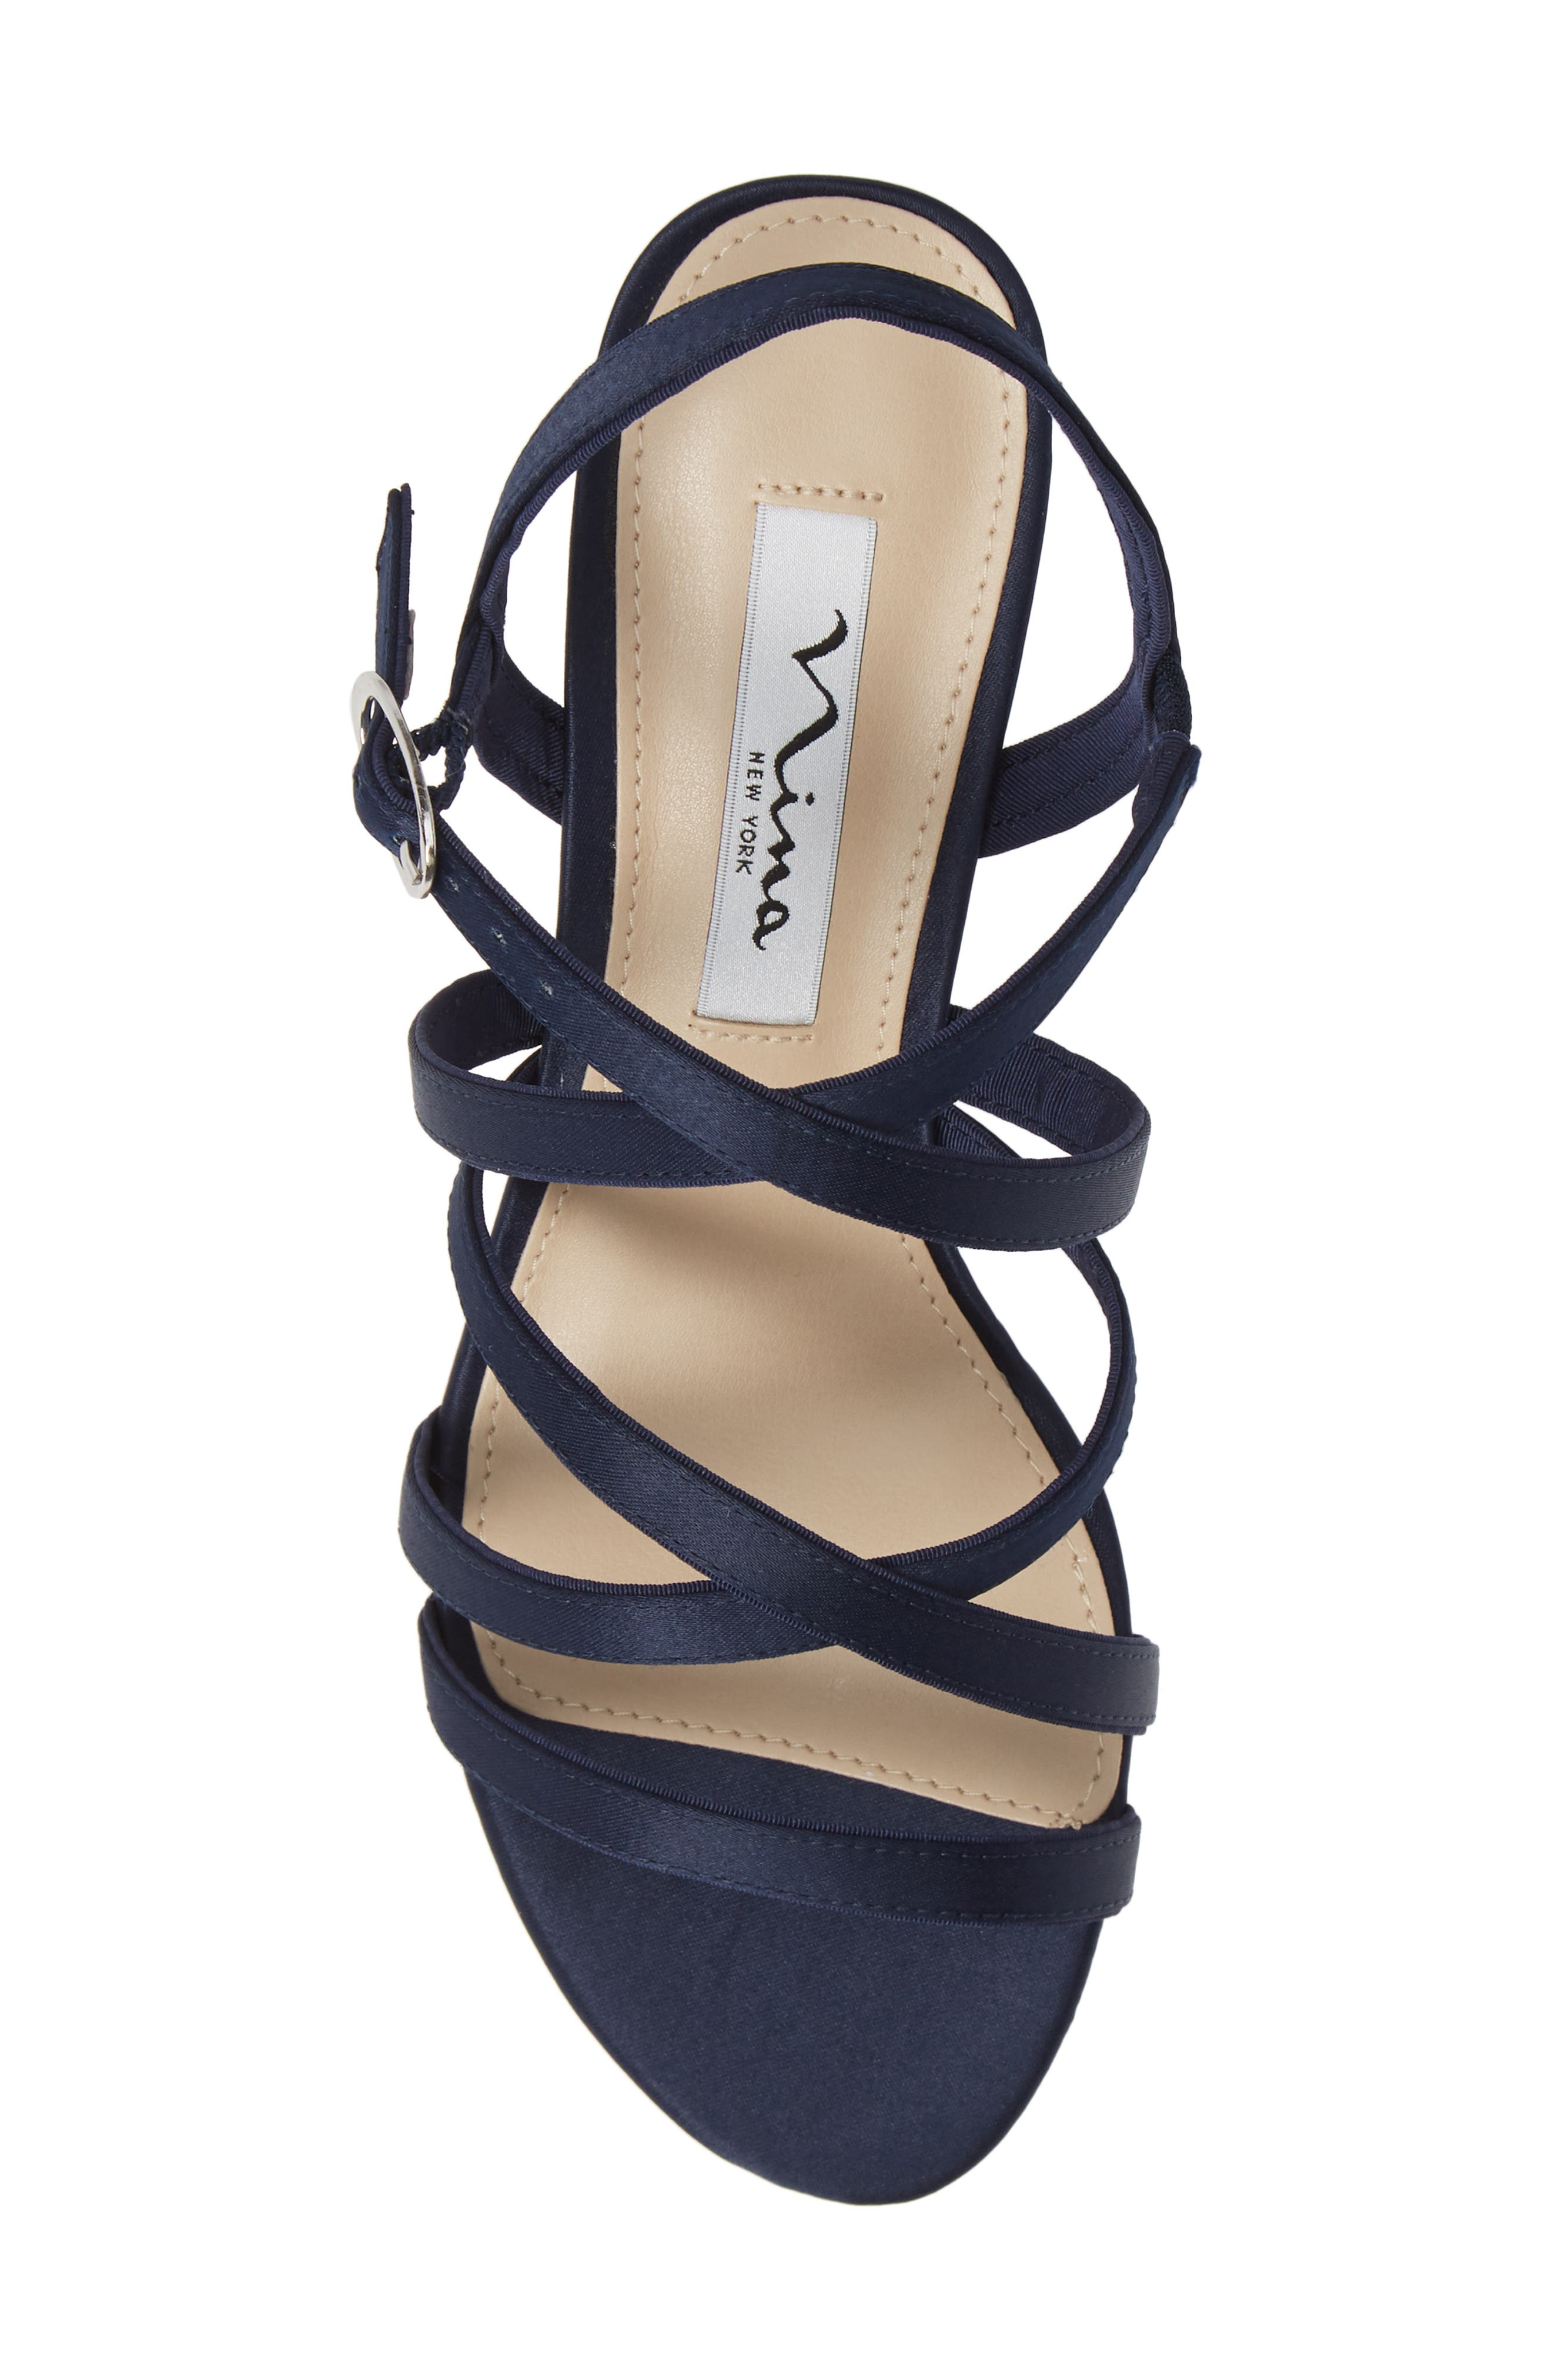 Genaya Strappy Evening Sandal,                             Alternate thumbnail 4, color,                             Navy Satin